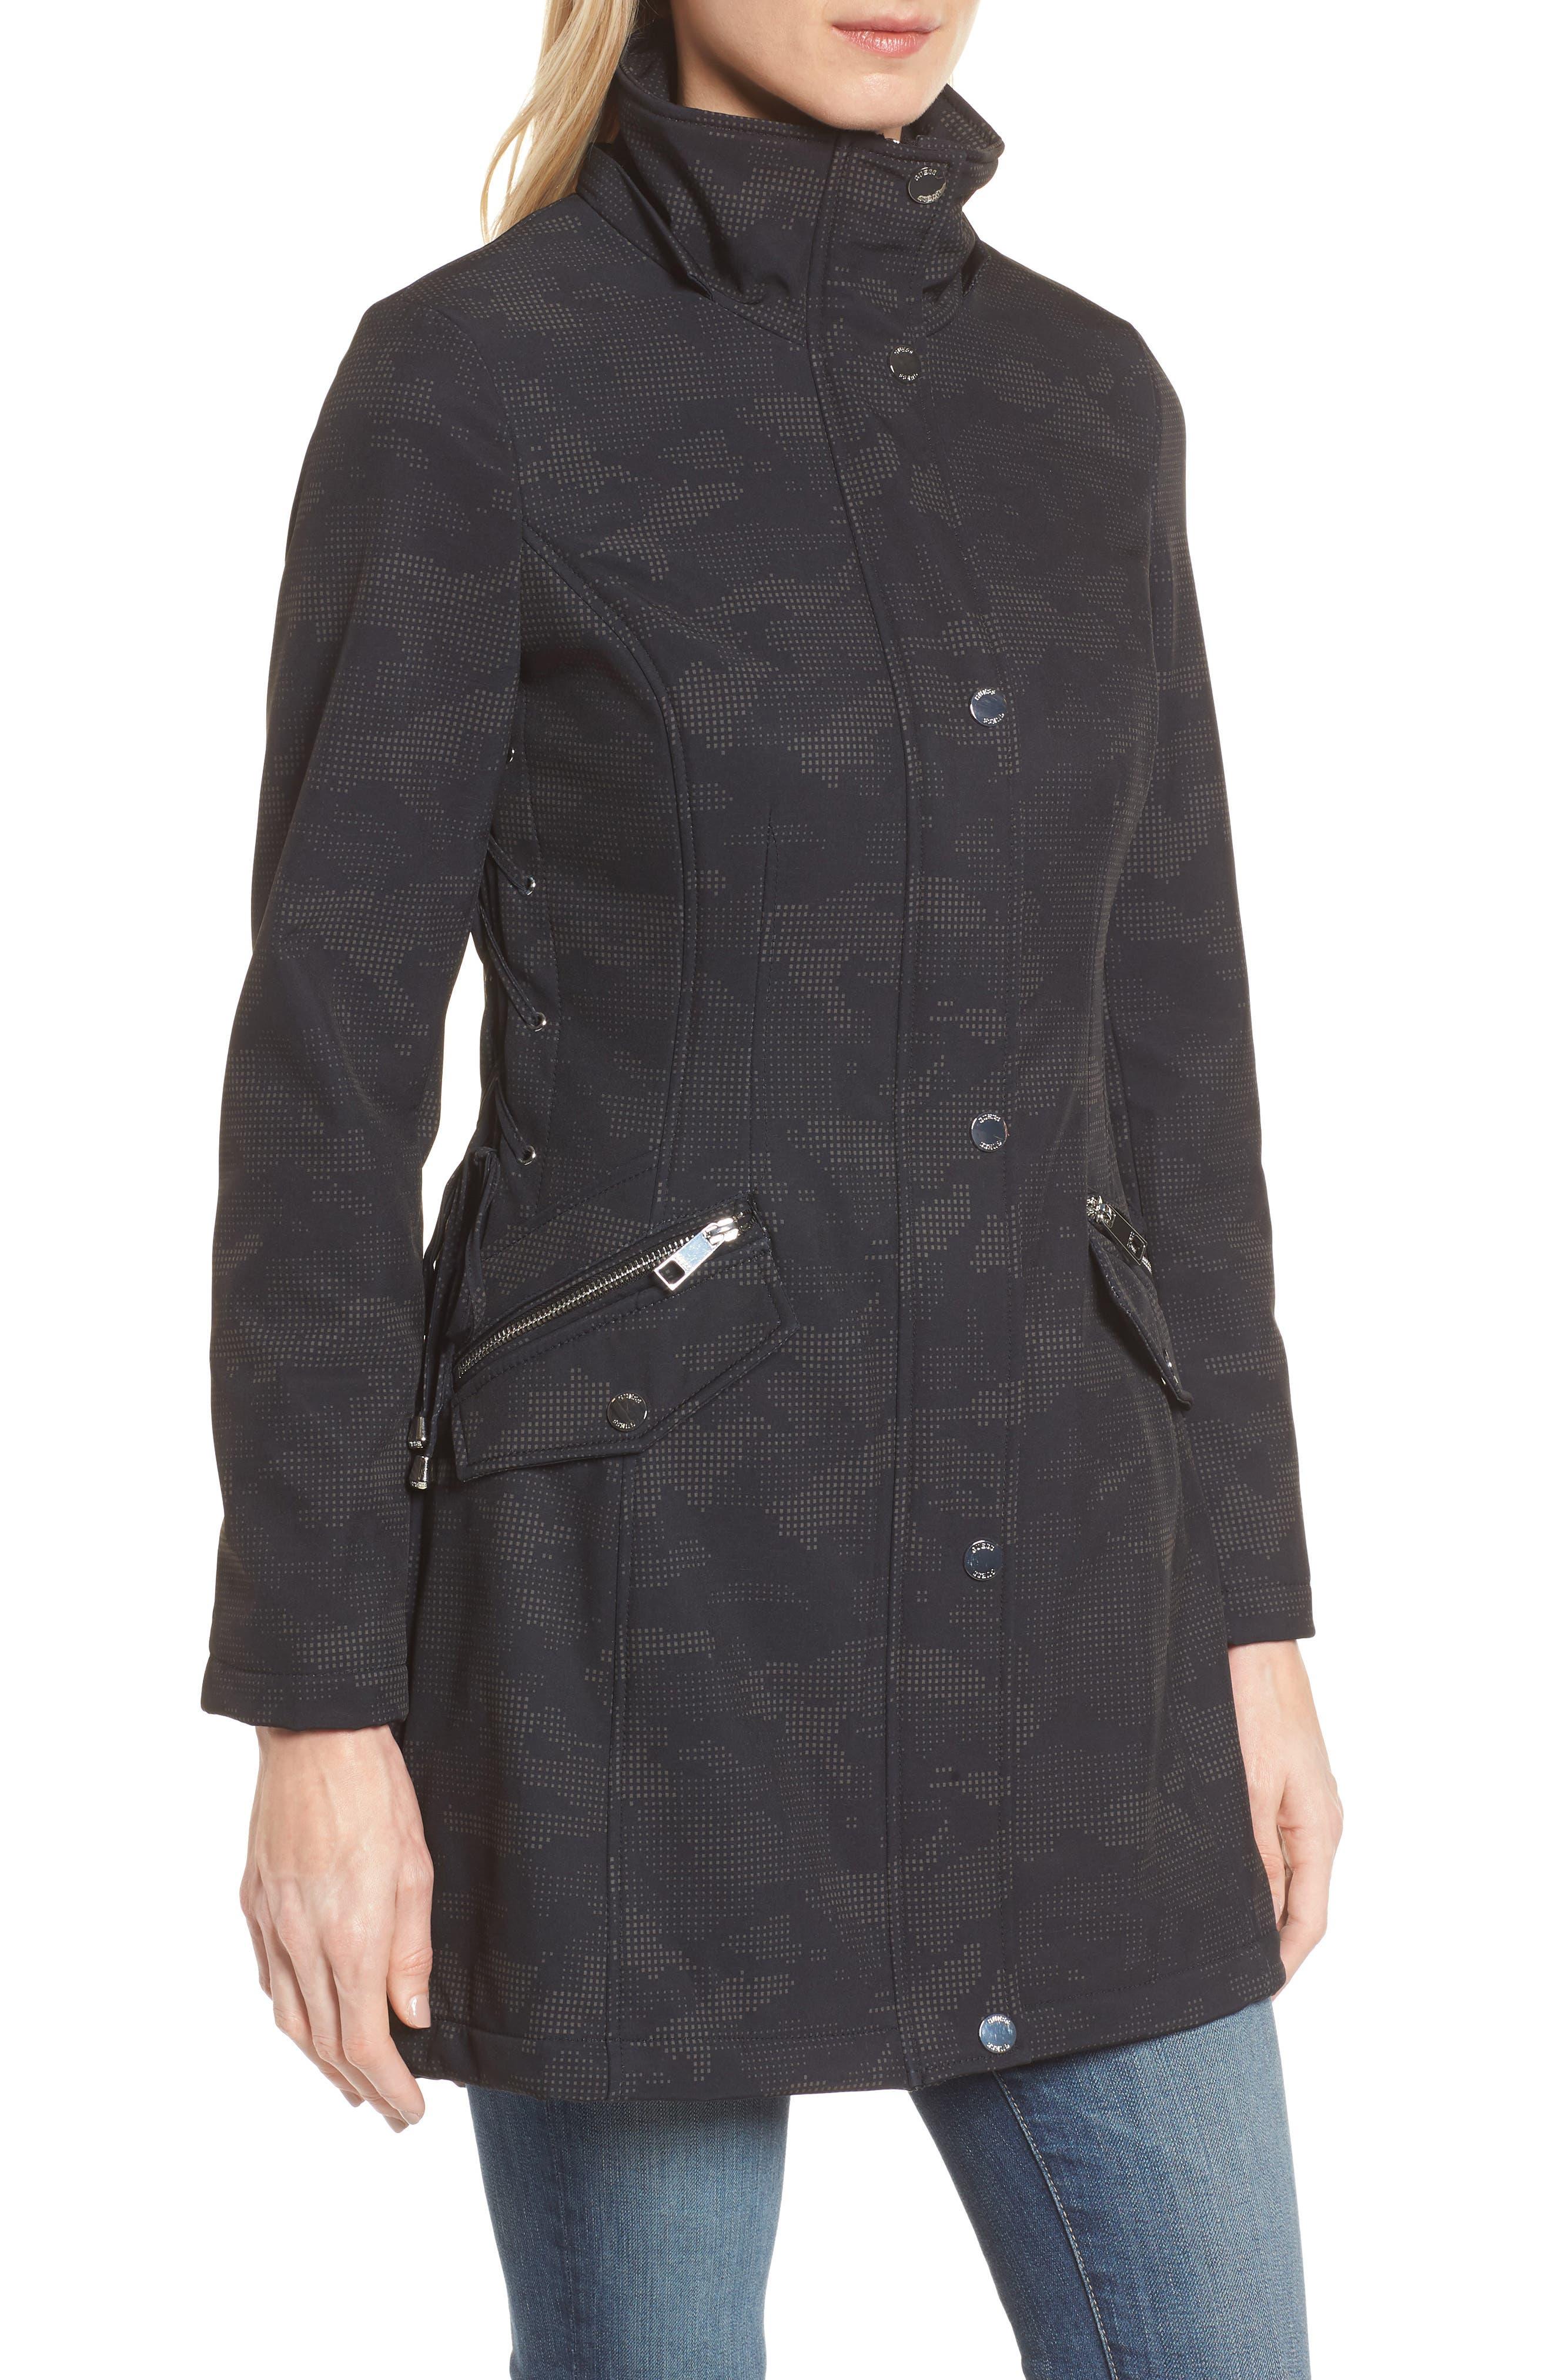 Lace-Up Hooded Jacket,                             Alternate thumbnail 4, color,                             Black Print